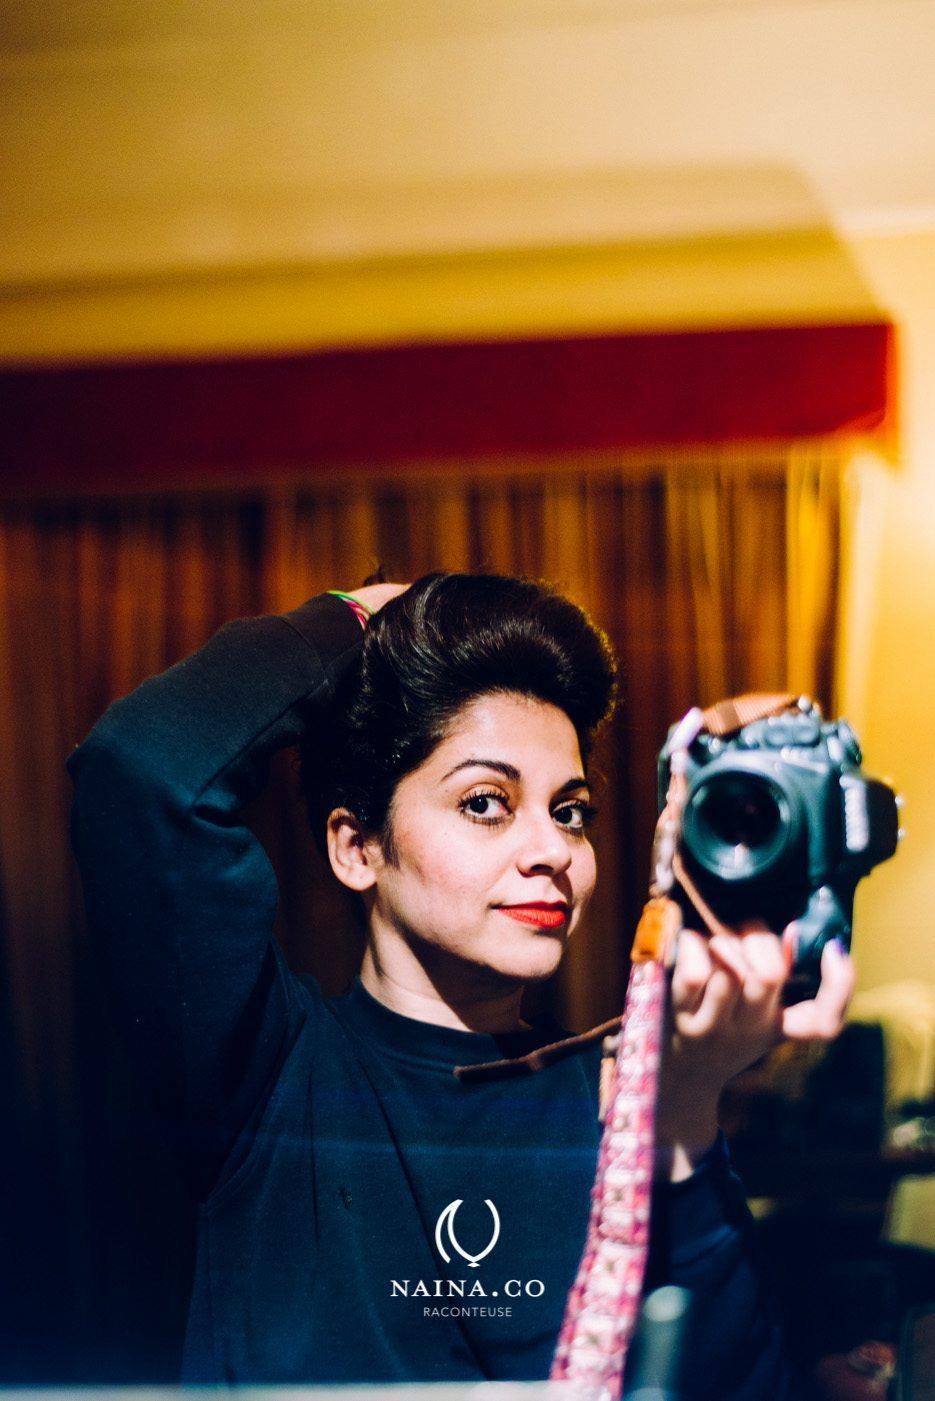 Naina.co-January-2014-03-Le-Meridien-Starwood-Jaipur-Literature-Festival-Unlock-Art-Raconteuse-Luxury-Storyteller-Photographer